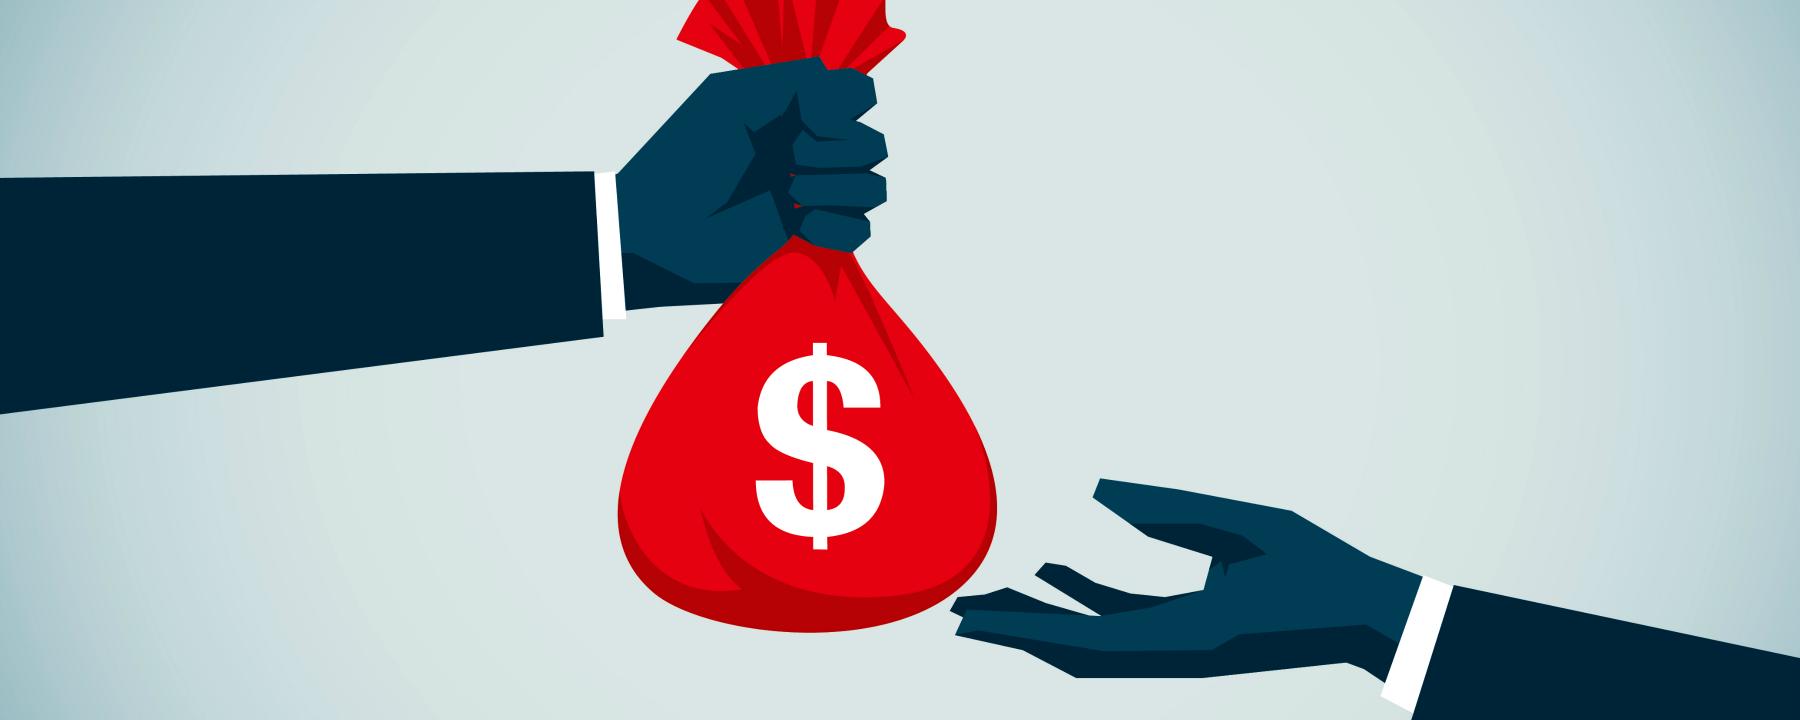 Universities Grapple with Donor Behavior